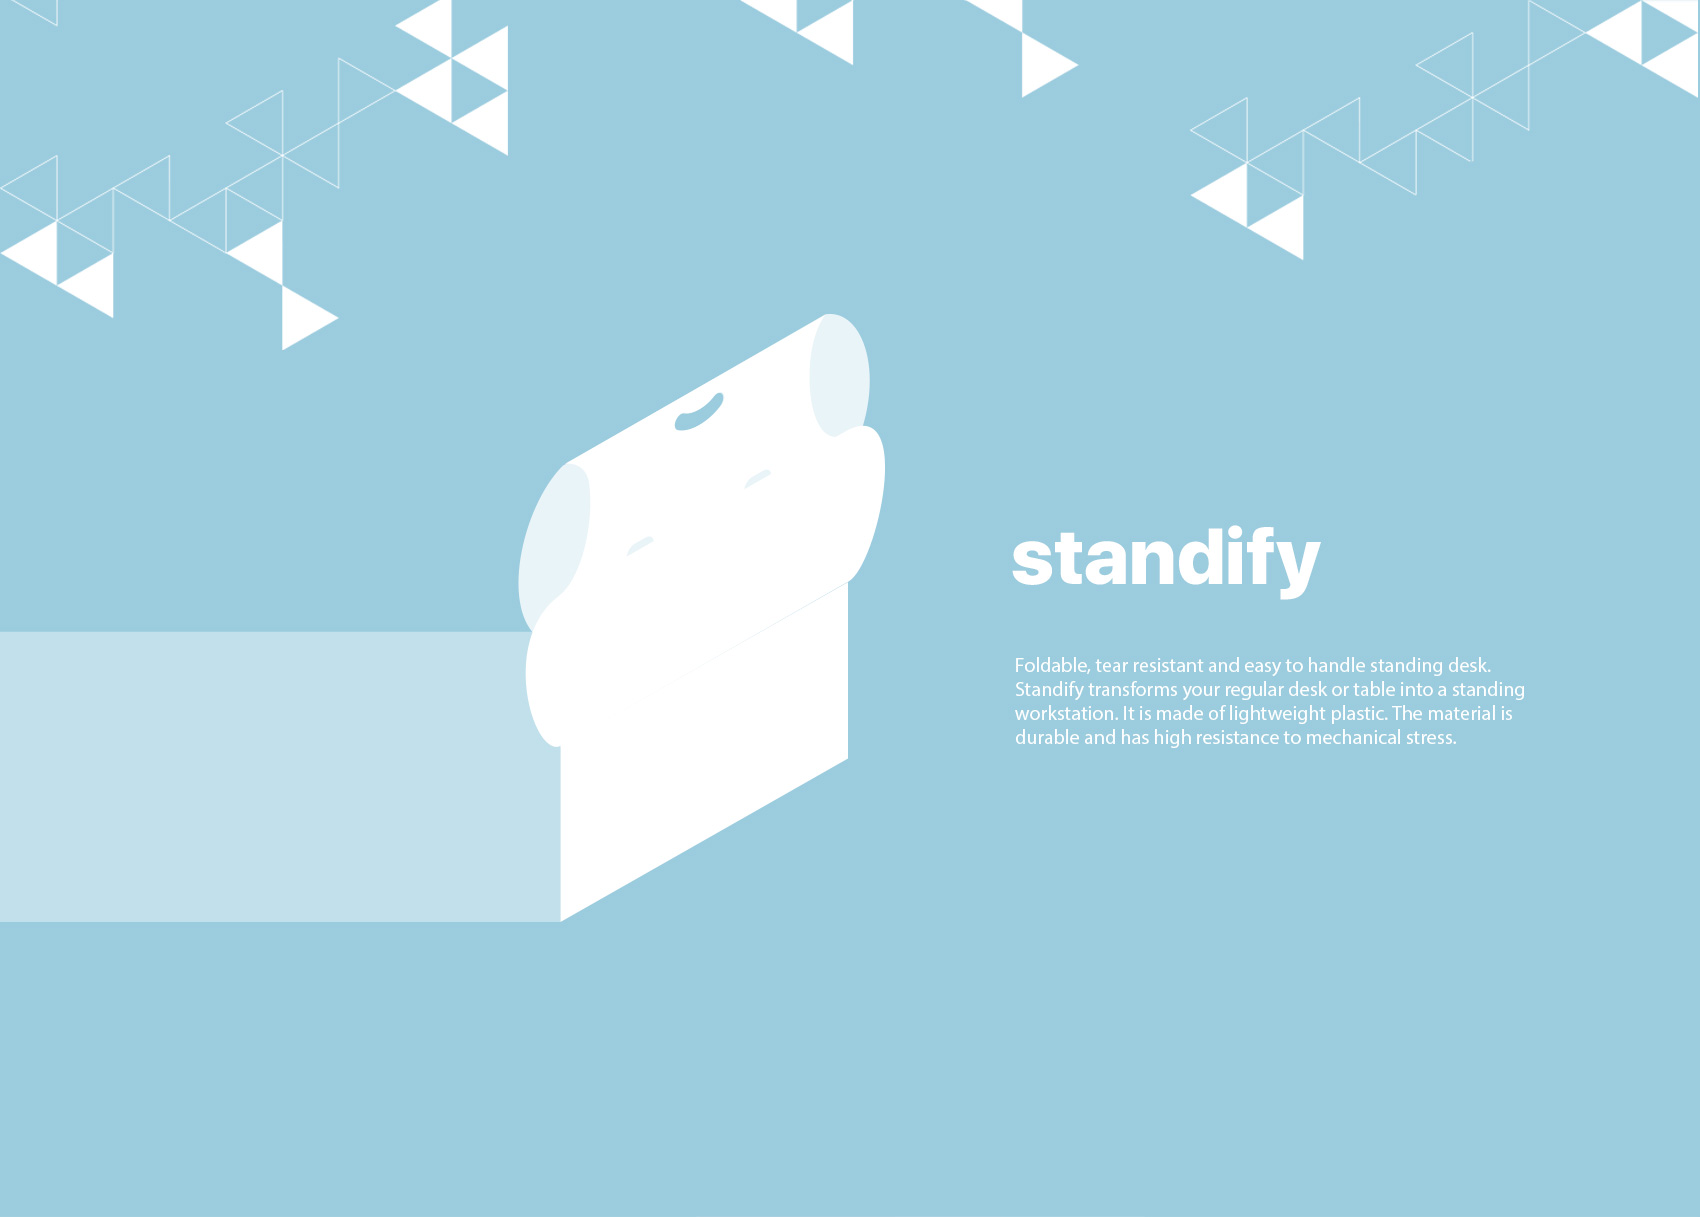 Standify